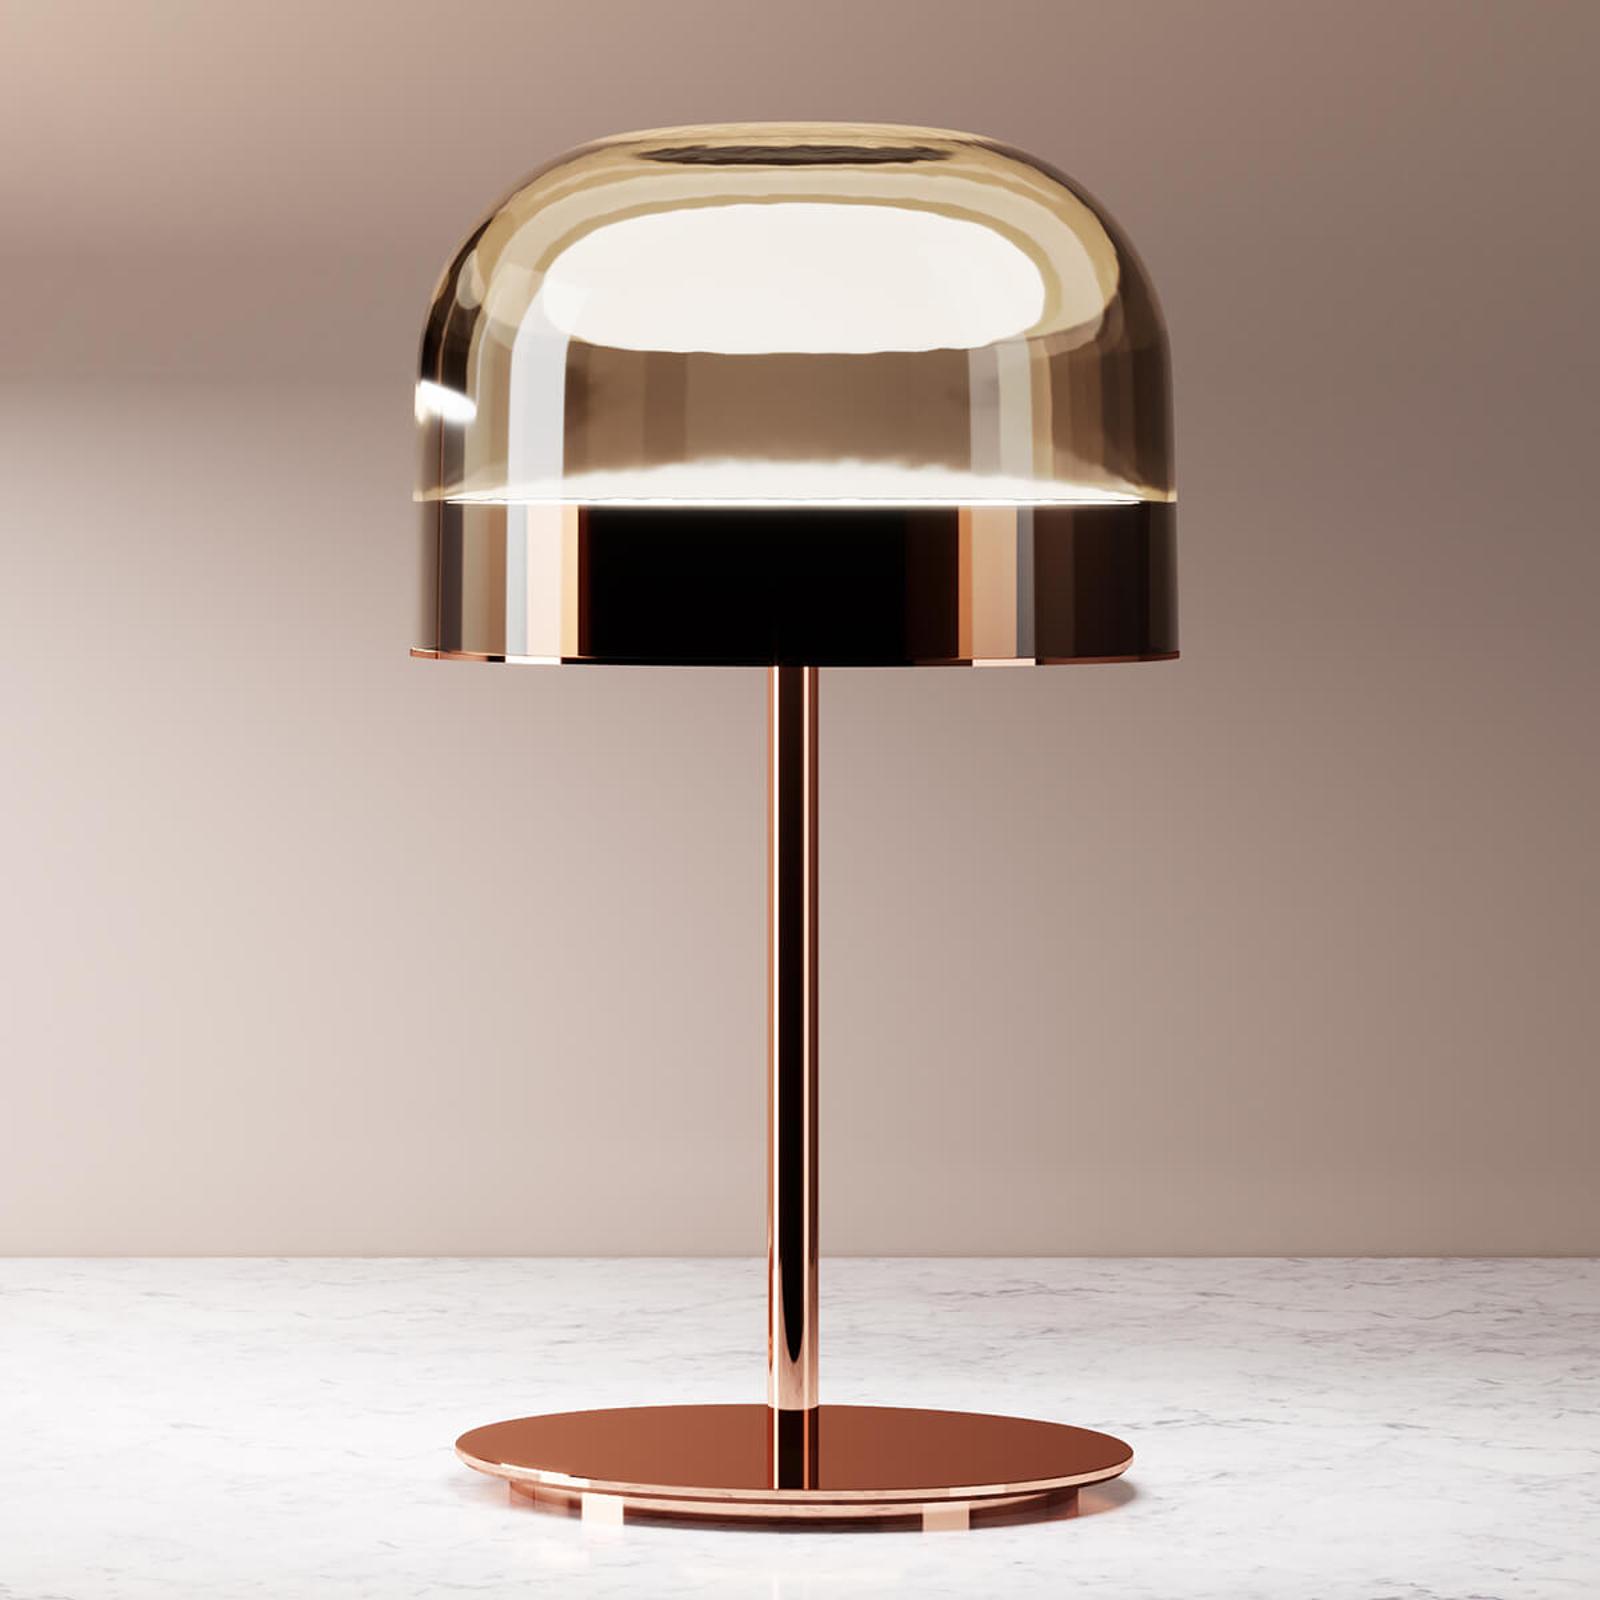 Equatore - lampada da tavolo LED di rame, 42,5 cm